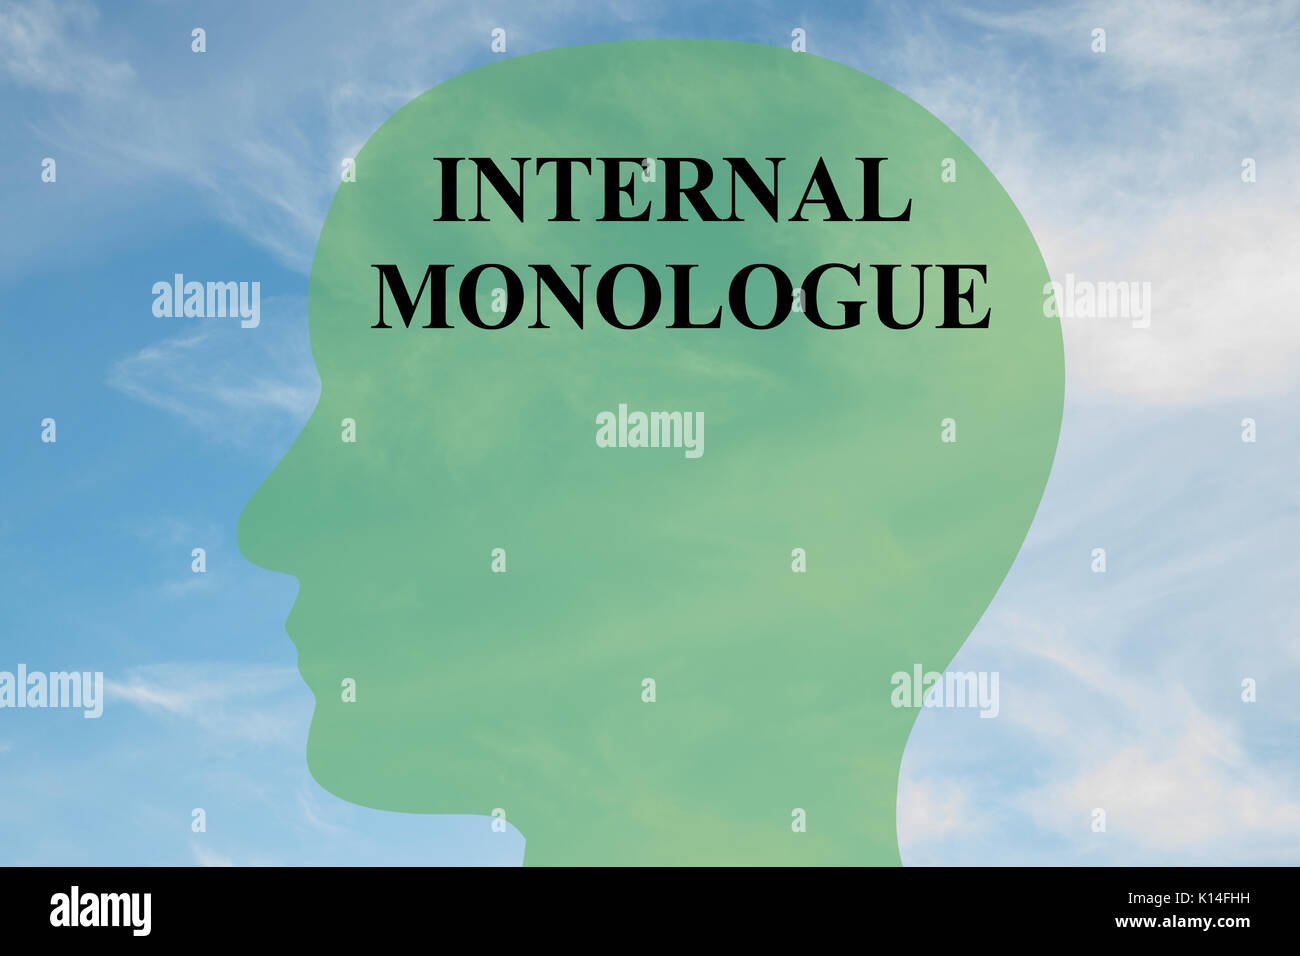 Monologue Stock Photos & Monologue Stock Images - Alamy